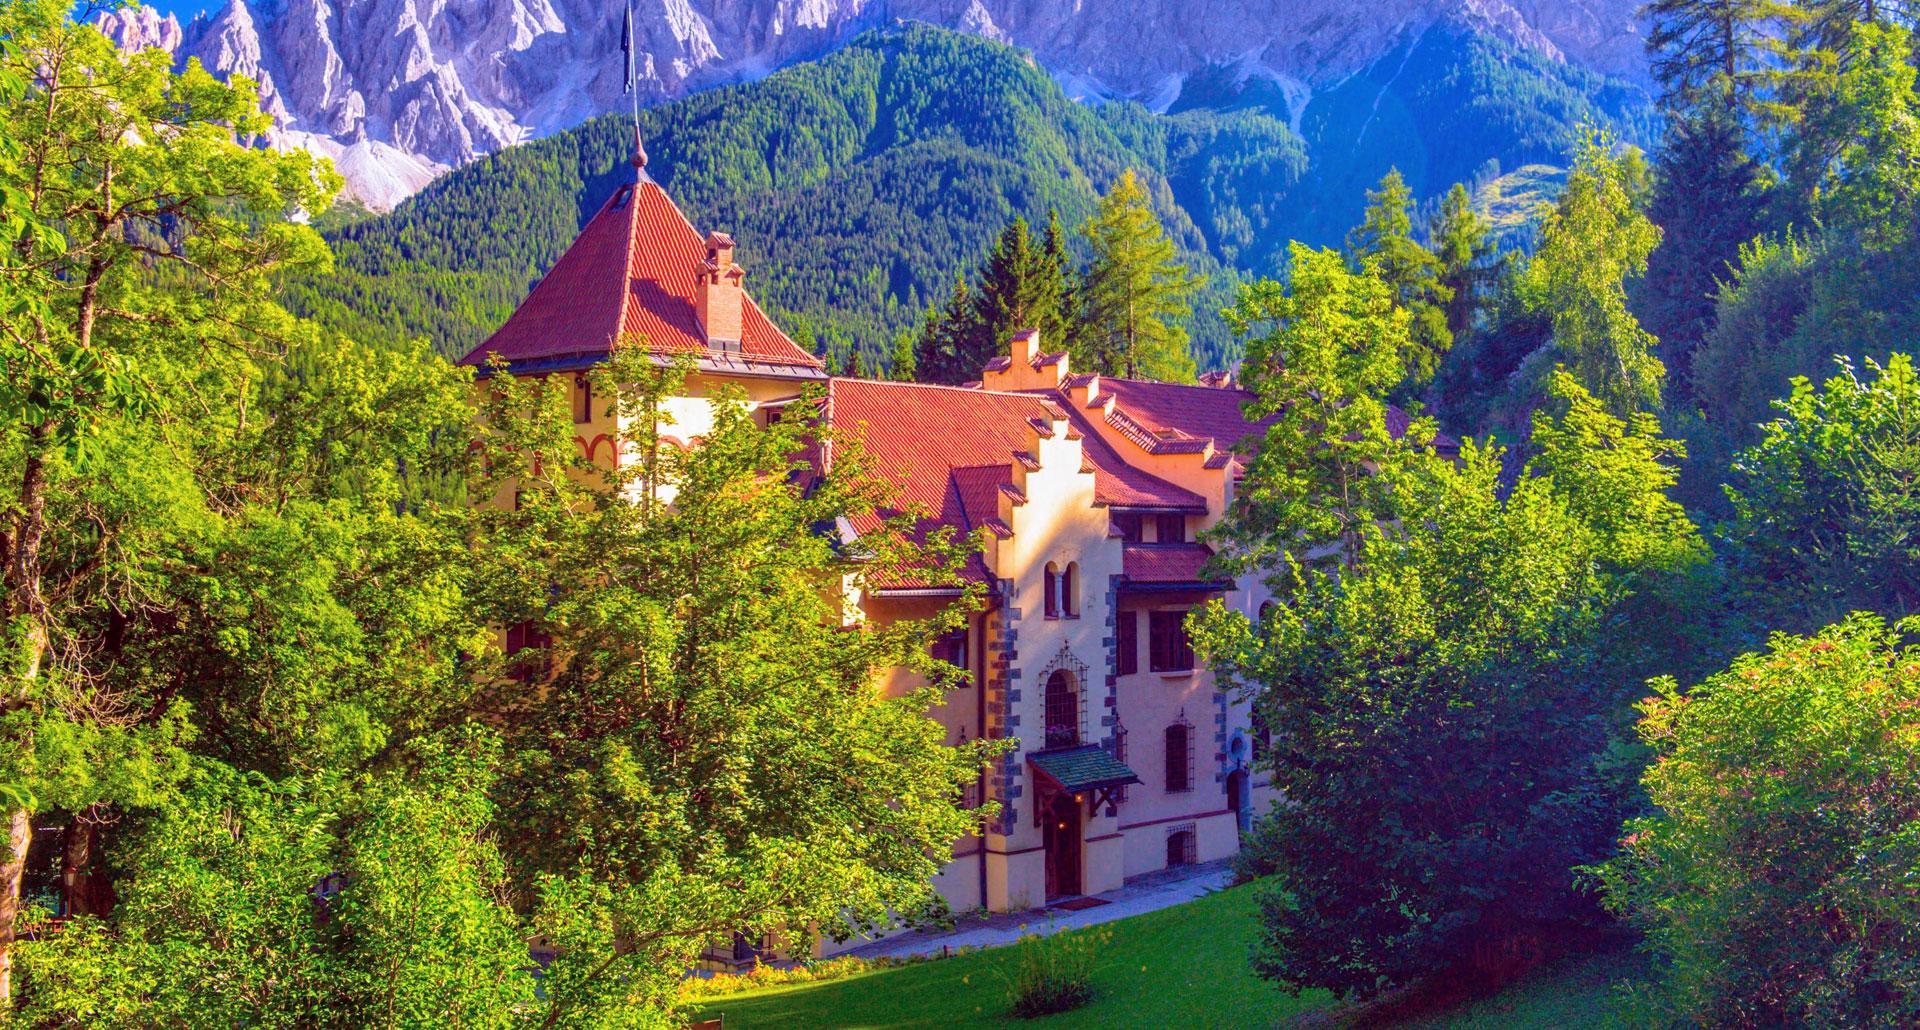 Valcastello Dolomite Chalet